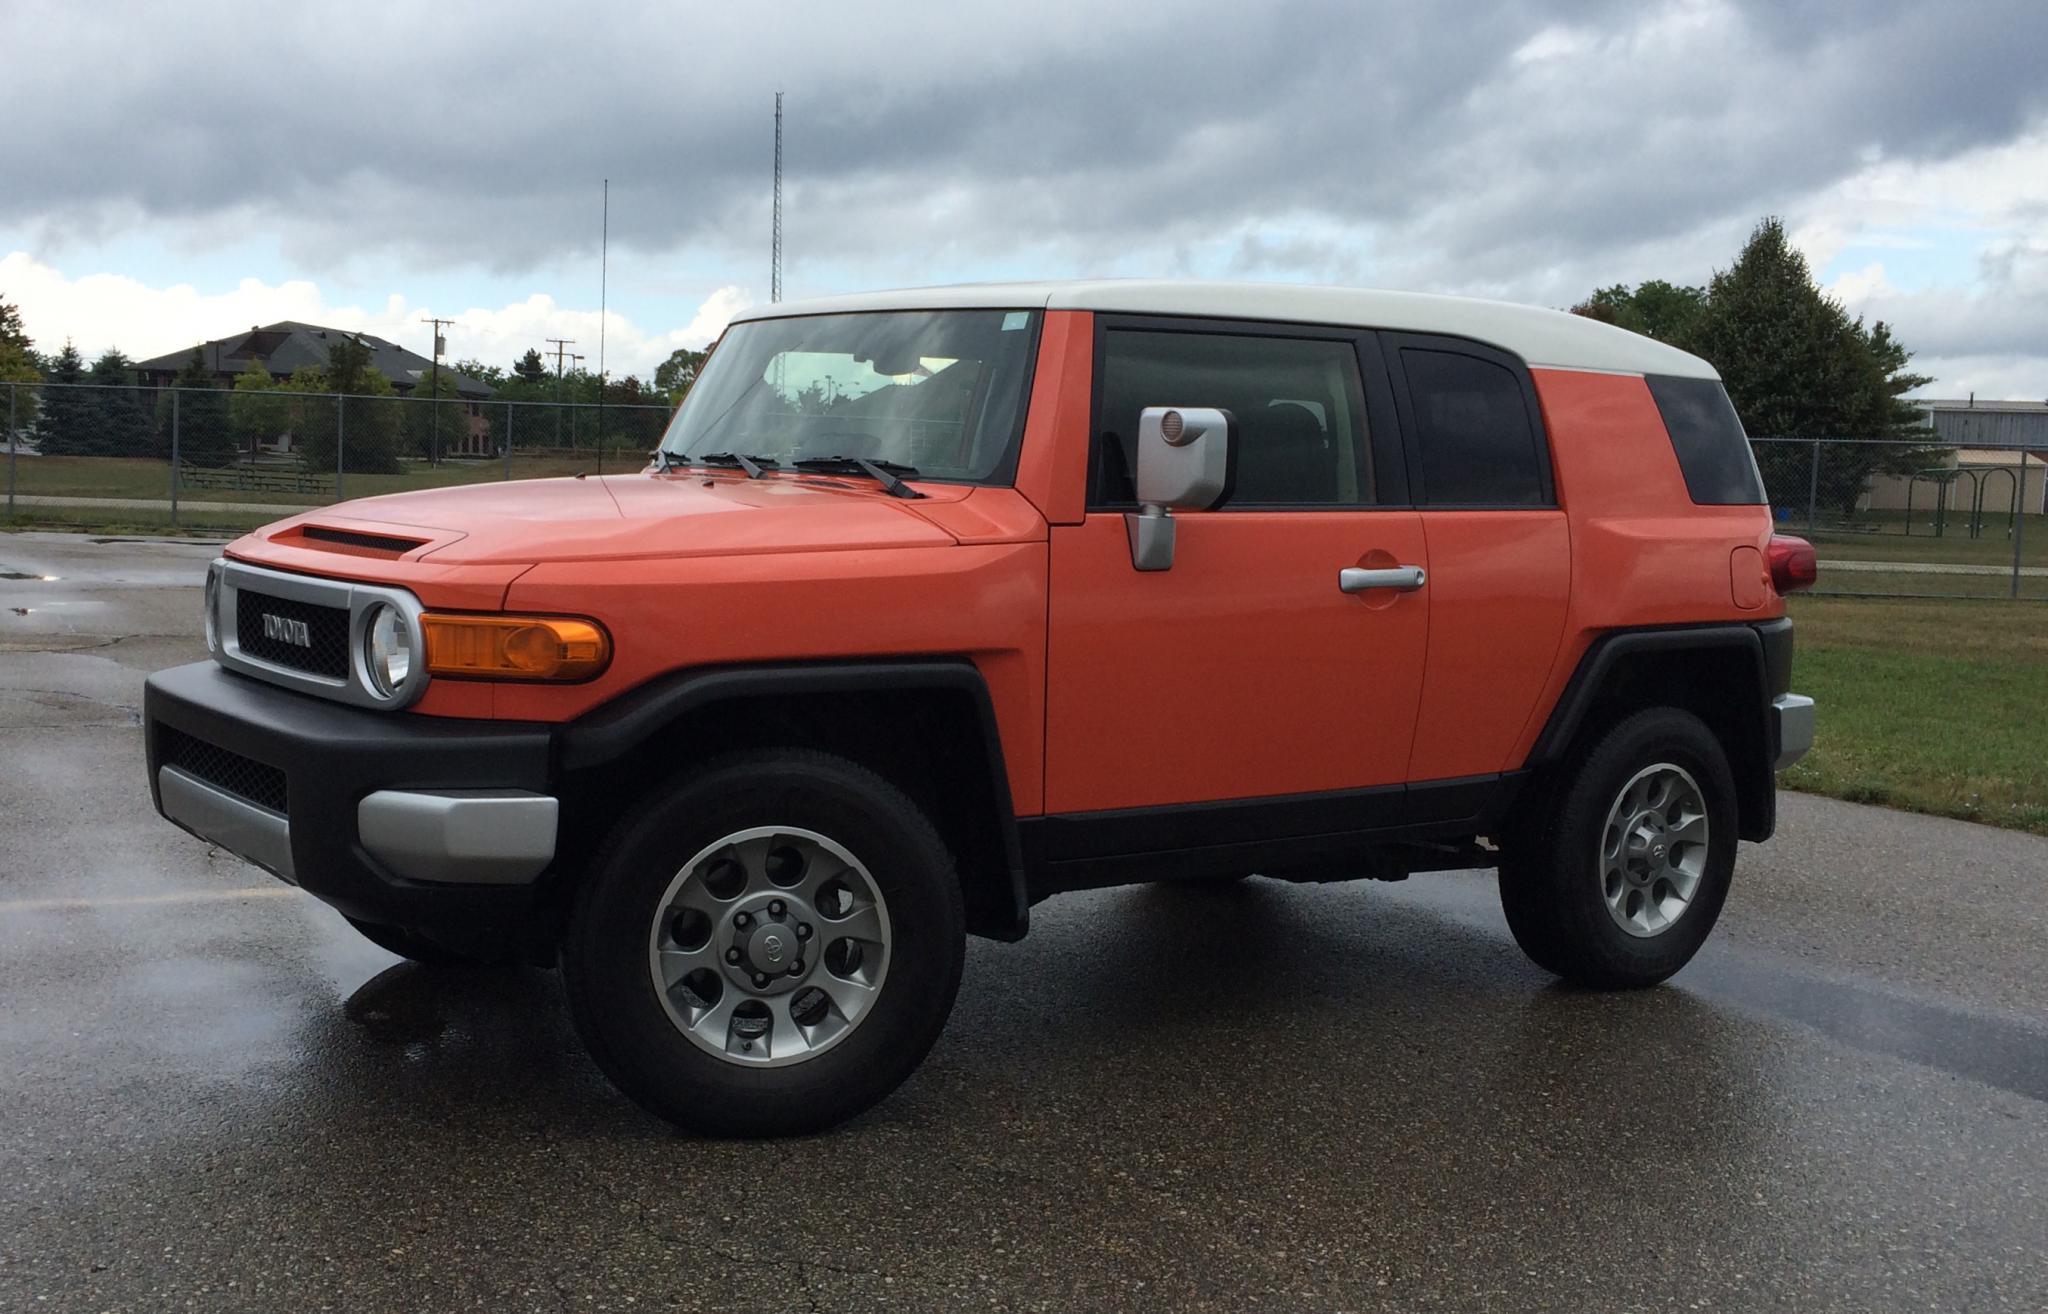 ksfrogmans build: Orange Crush | Toyota FJ Cruiser Forum